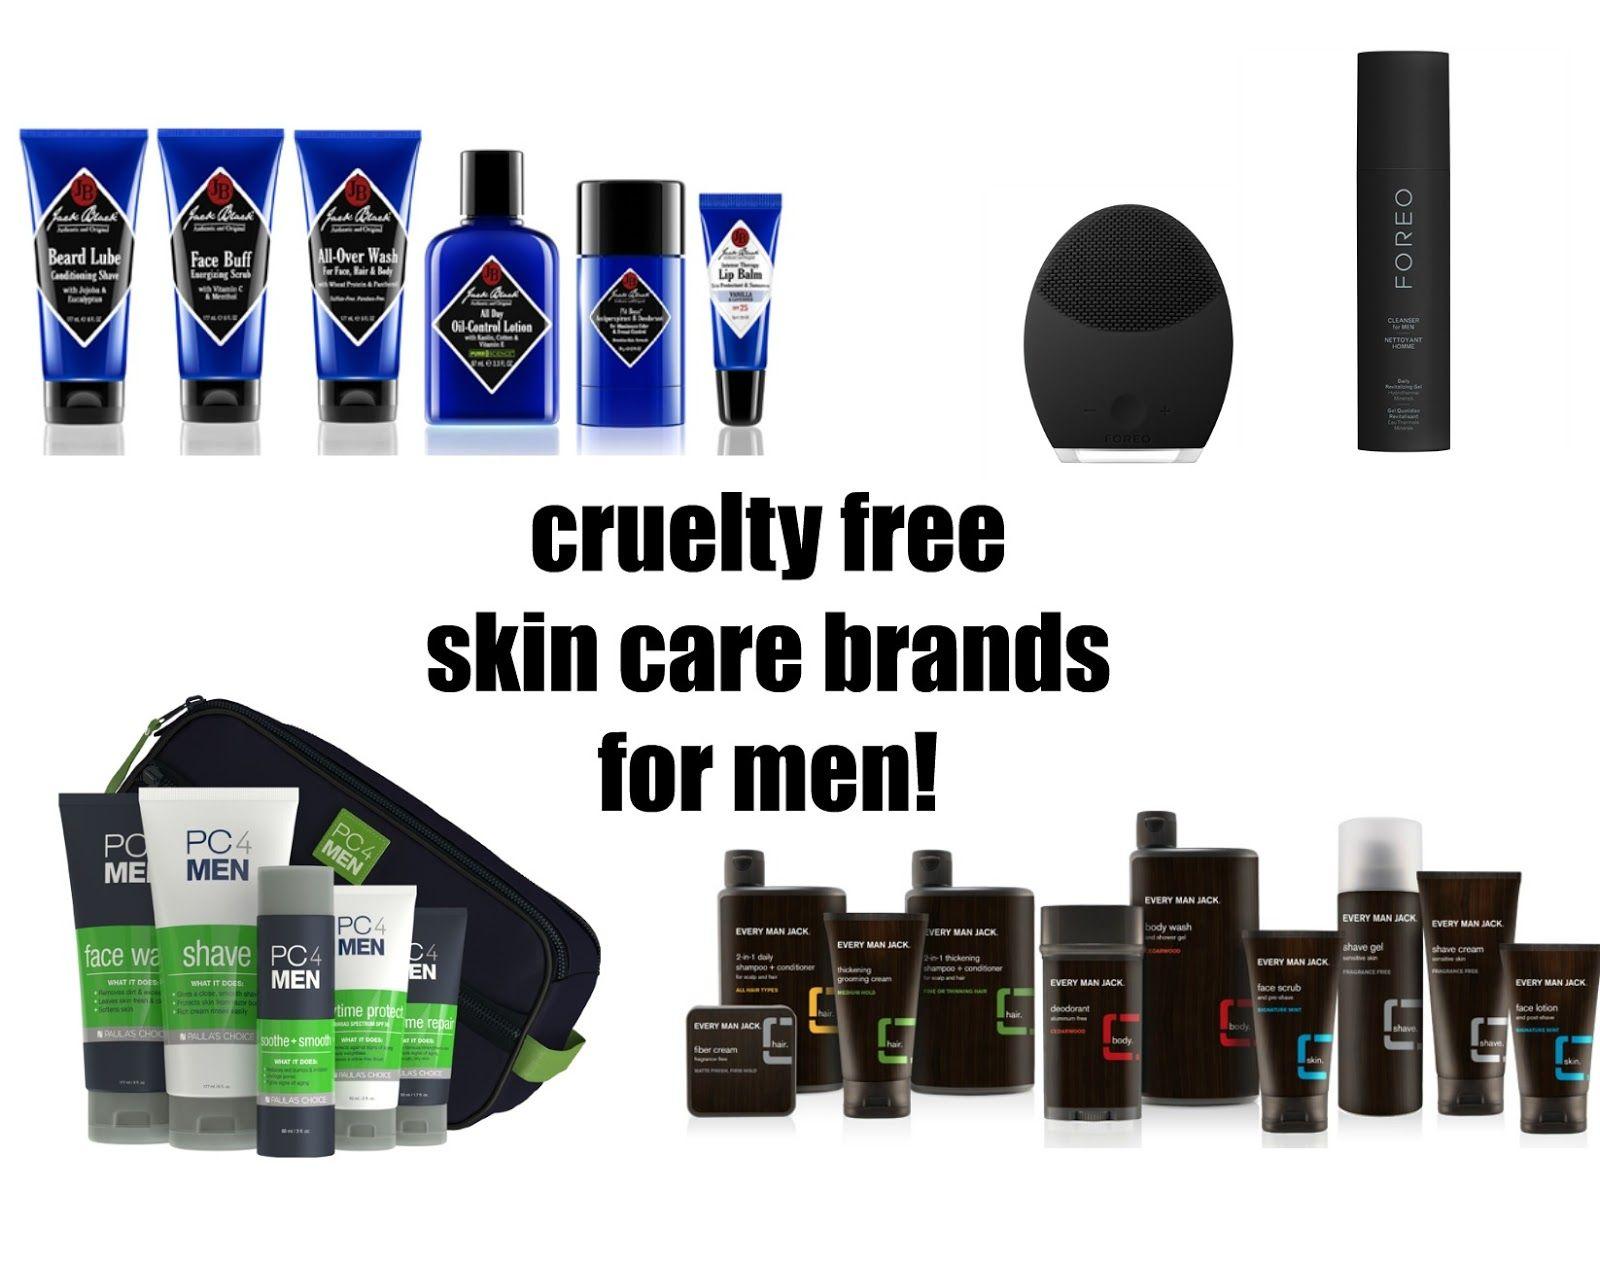 Cruelty Free Skin Care brands for men! Beauty4Free2U